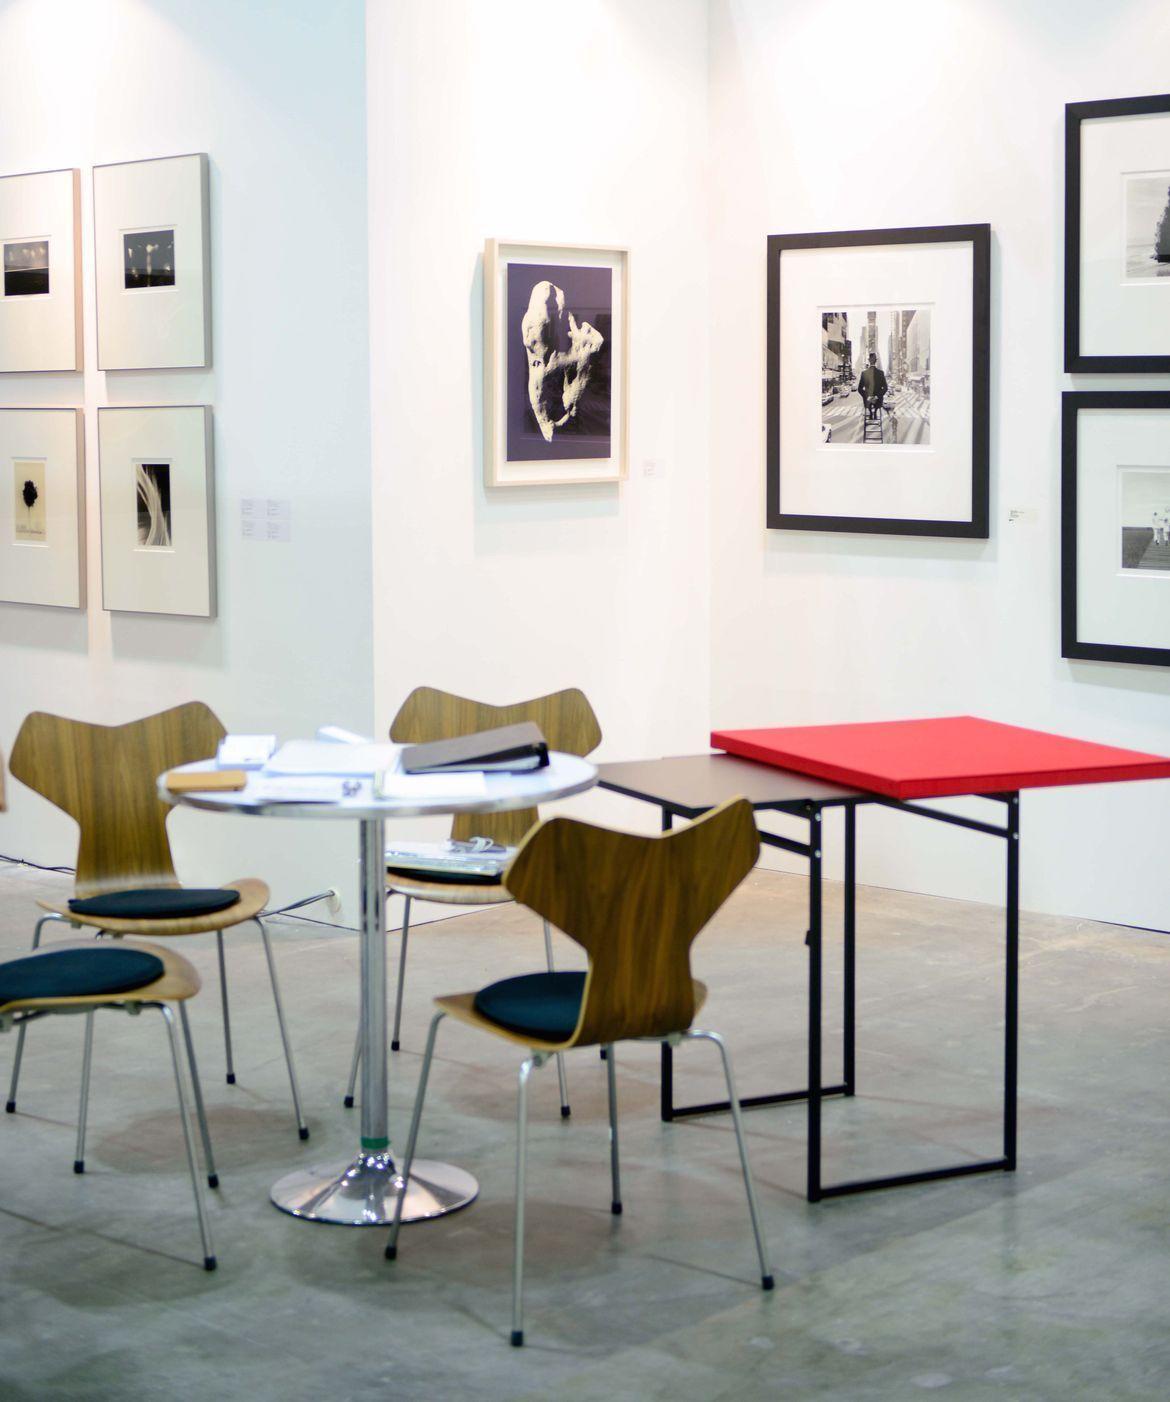 contemporary art furniture. Contemporary Art, Photography, And Home Decor At The Milan Image Art \u0026 Design Fair Furniture A